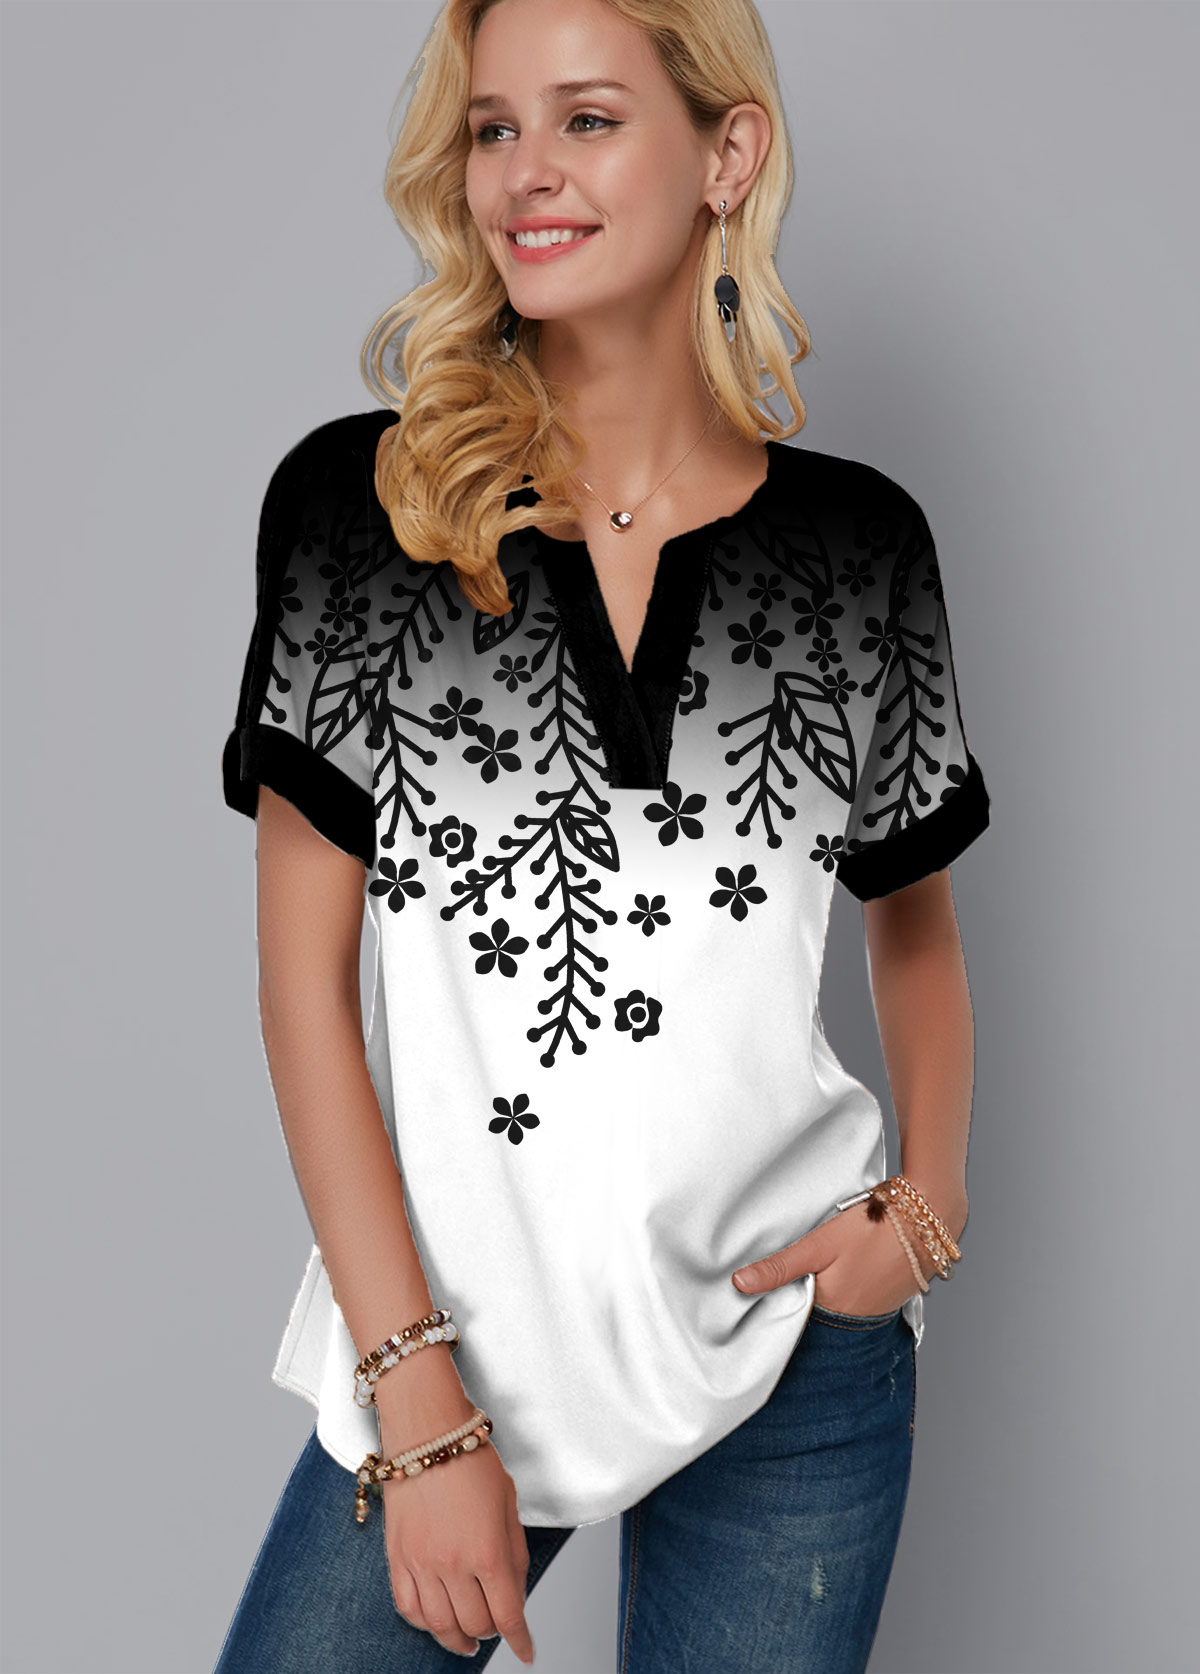 Short Sleeve Multi Color Printed T Shirt